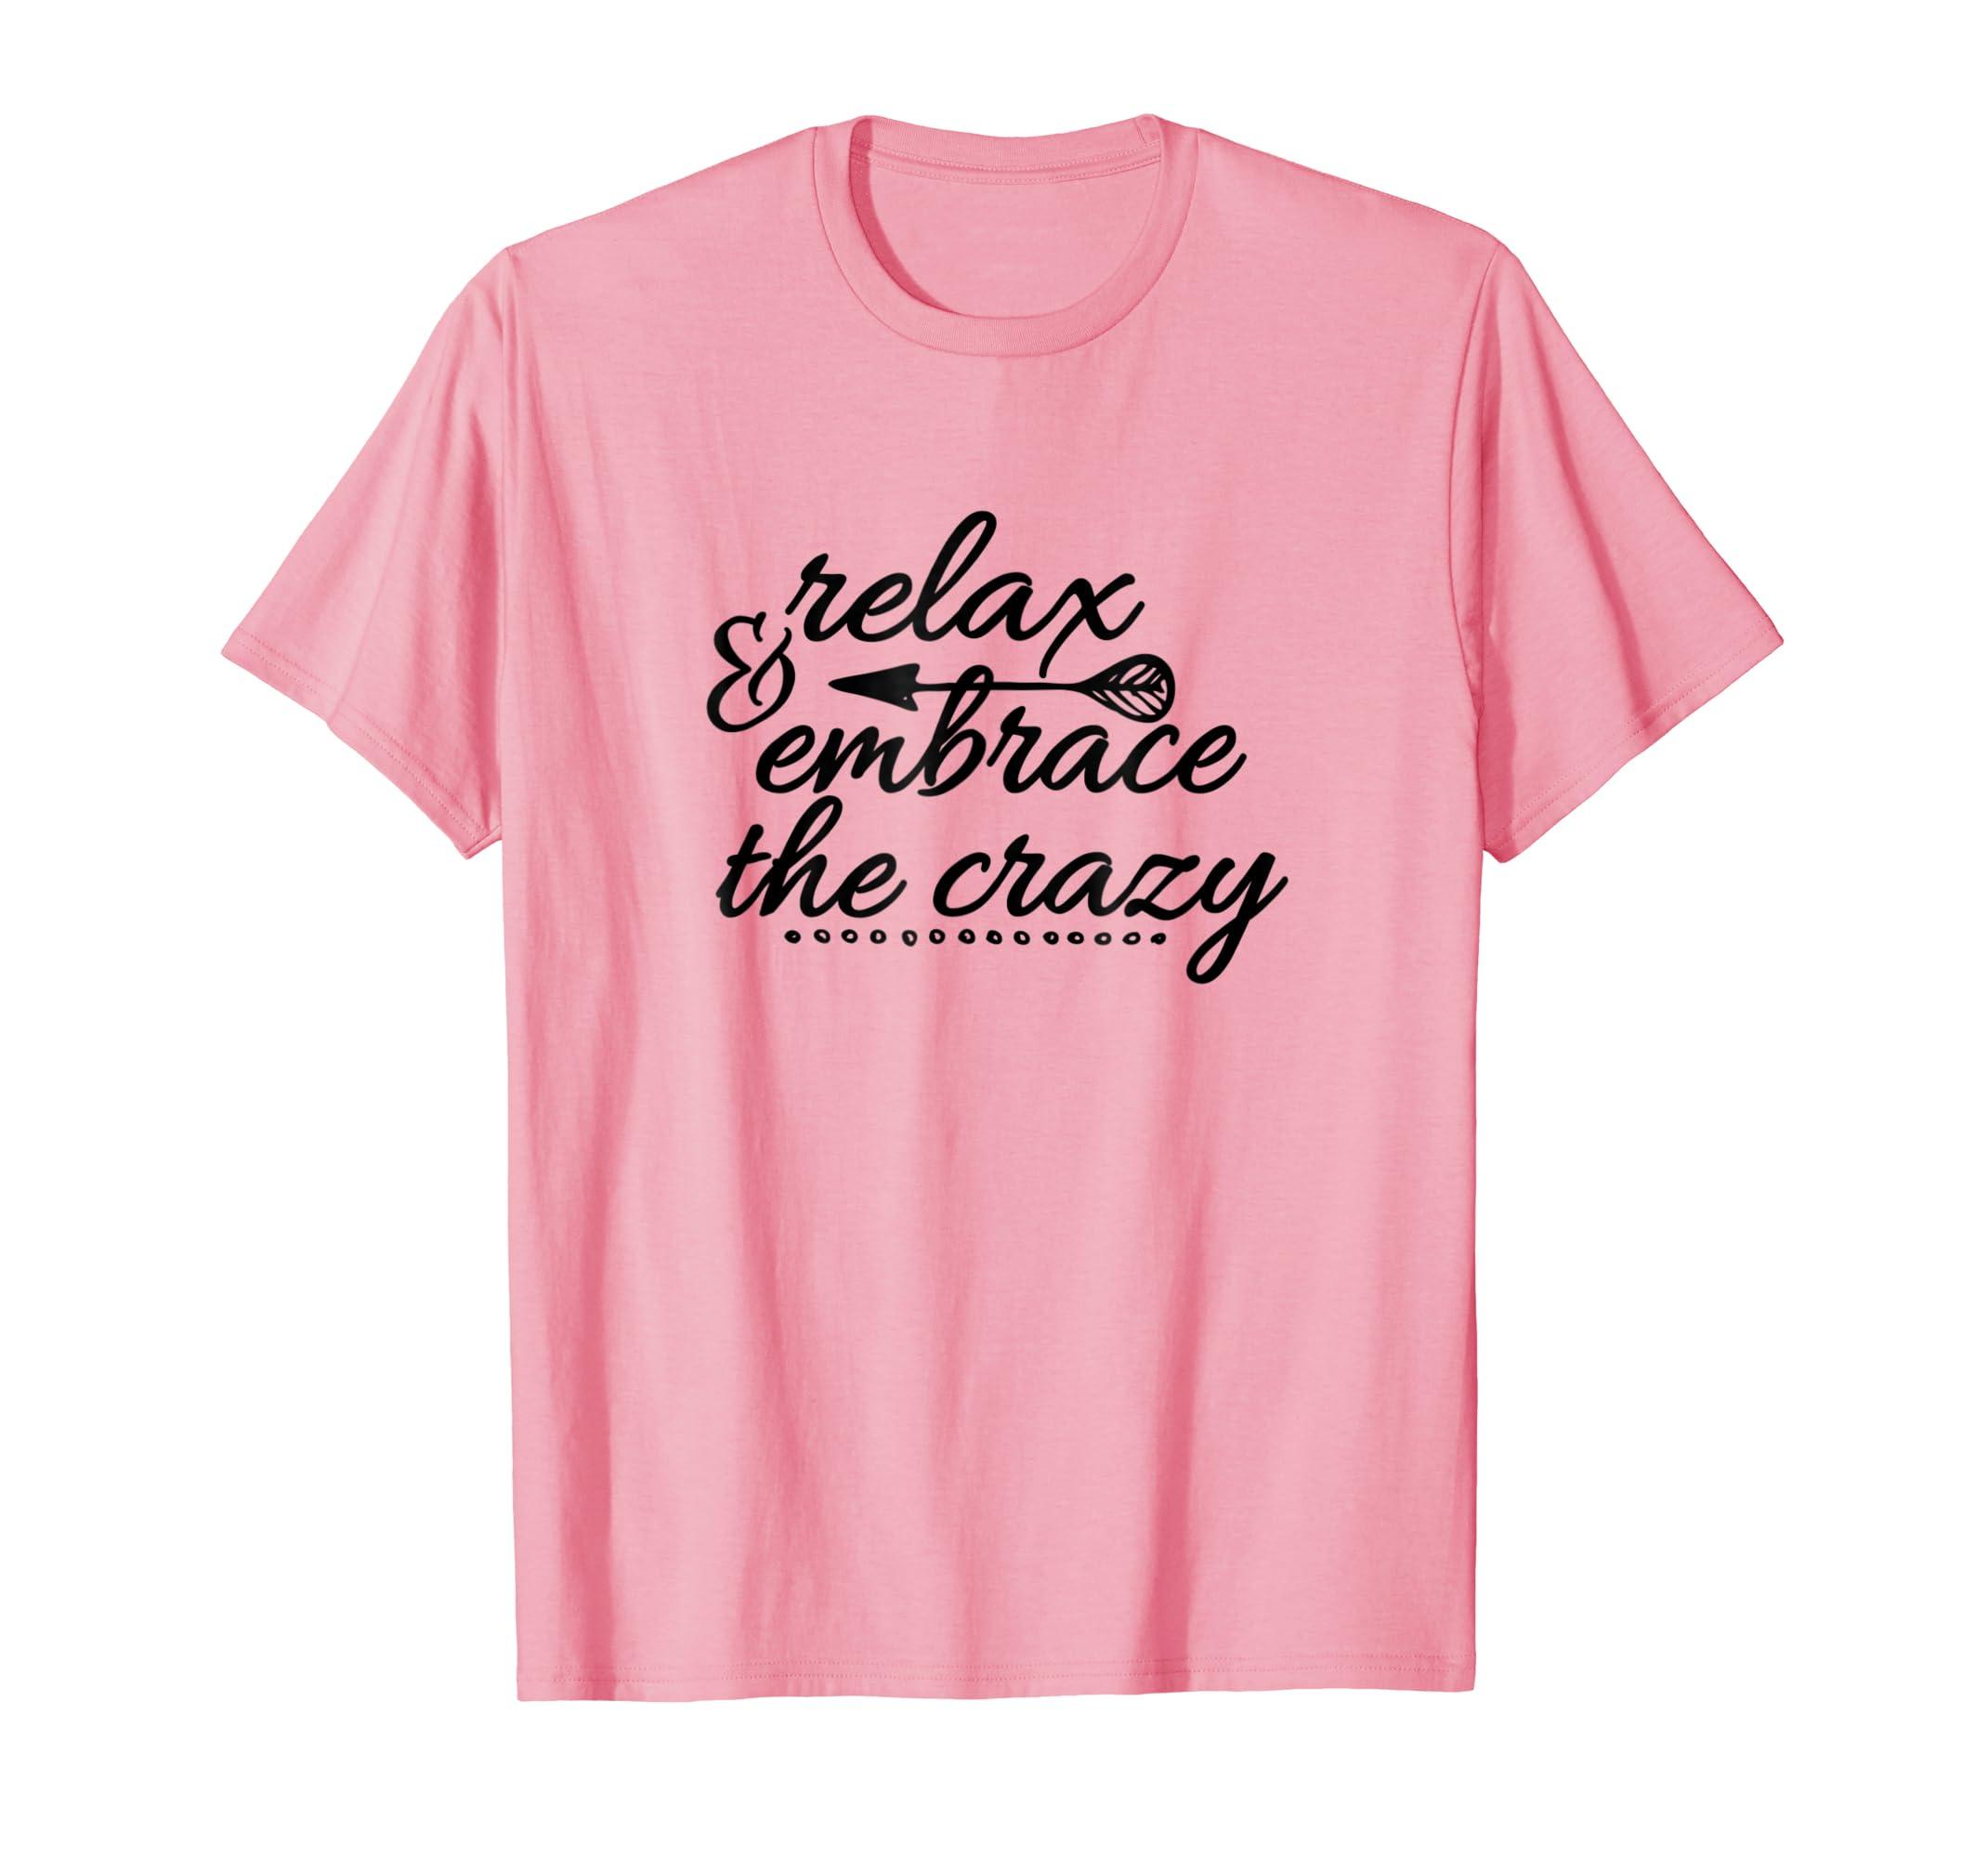 28a14953 Amazon.com: Family Reunion Shirt Embrace The Crazy Funny Tee: Clothing